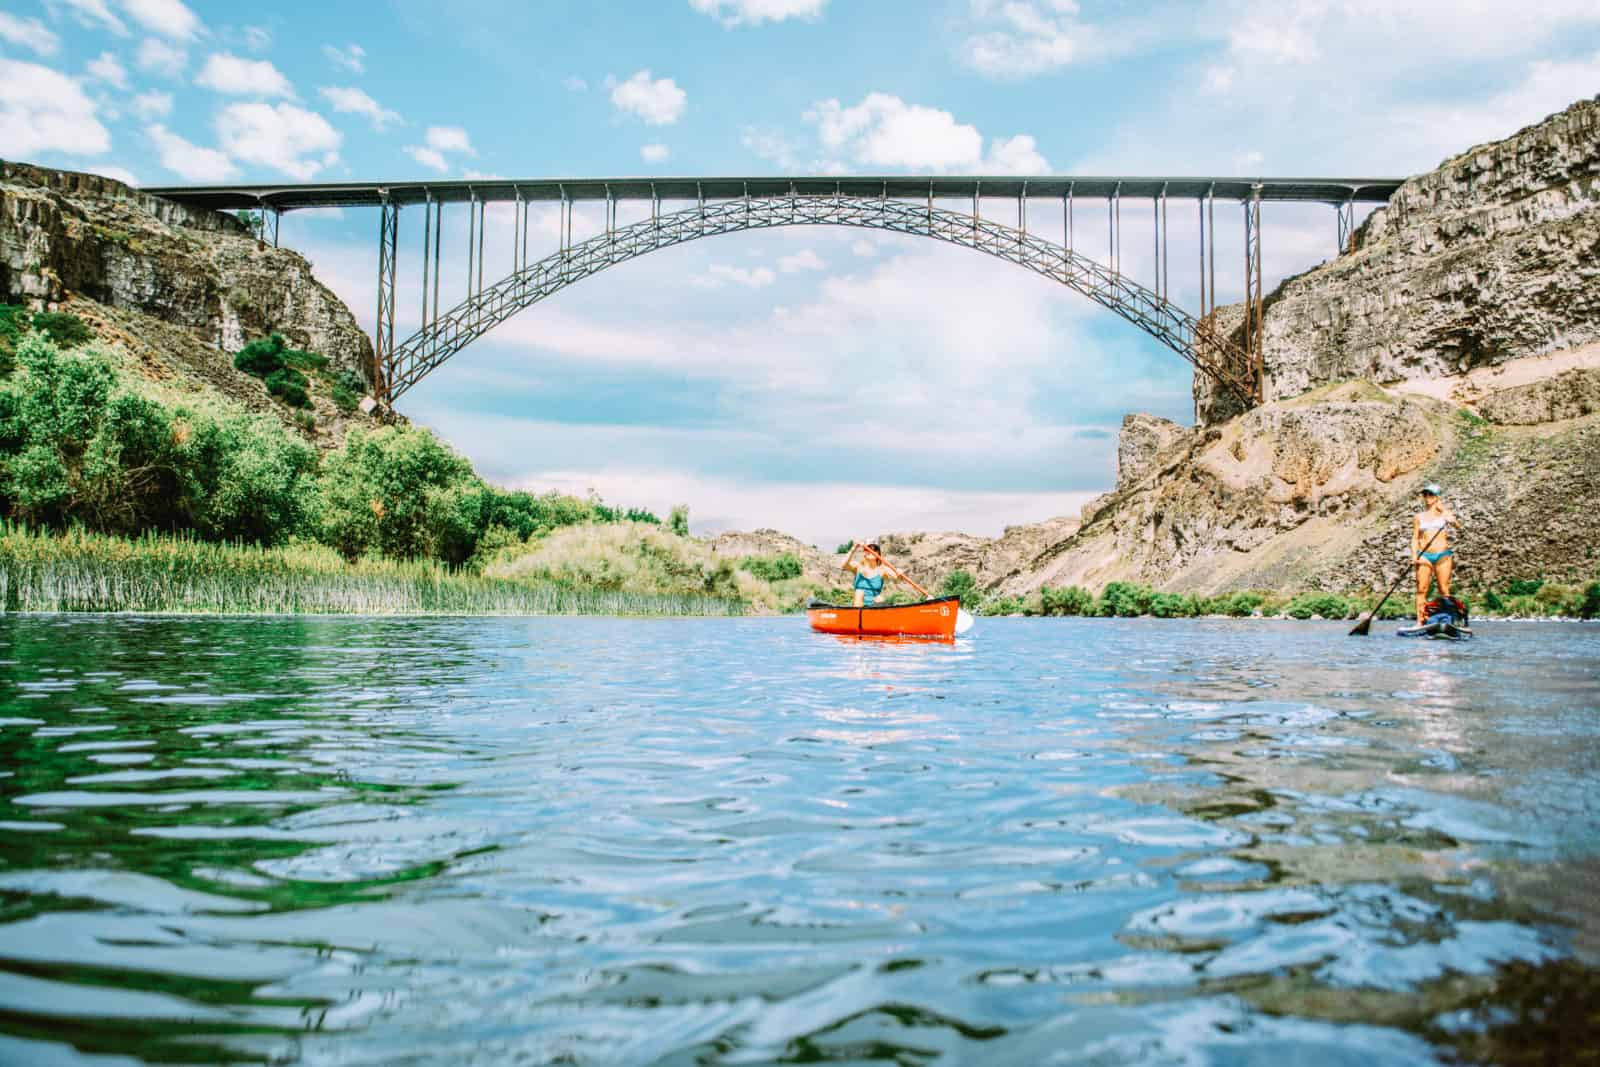 Orange canoe on water under a bridge